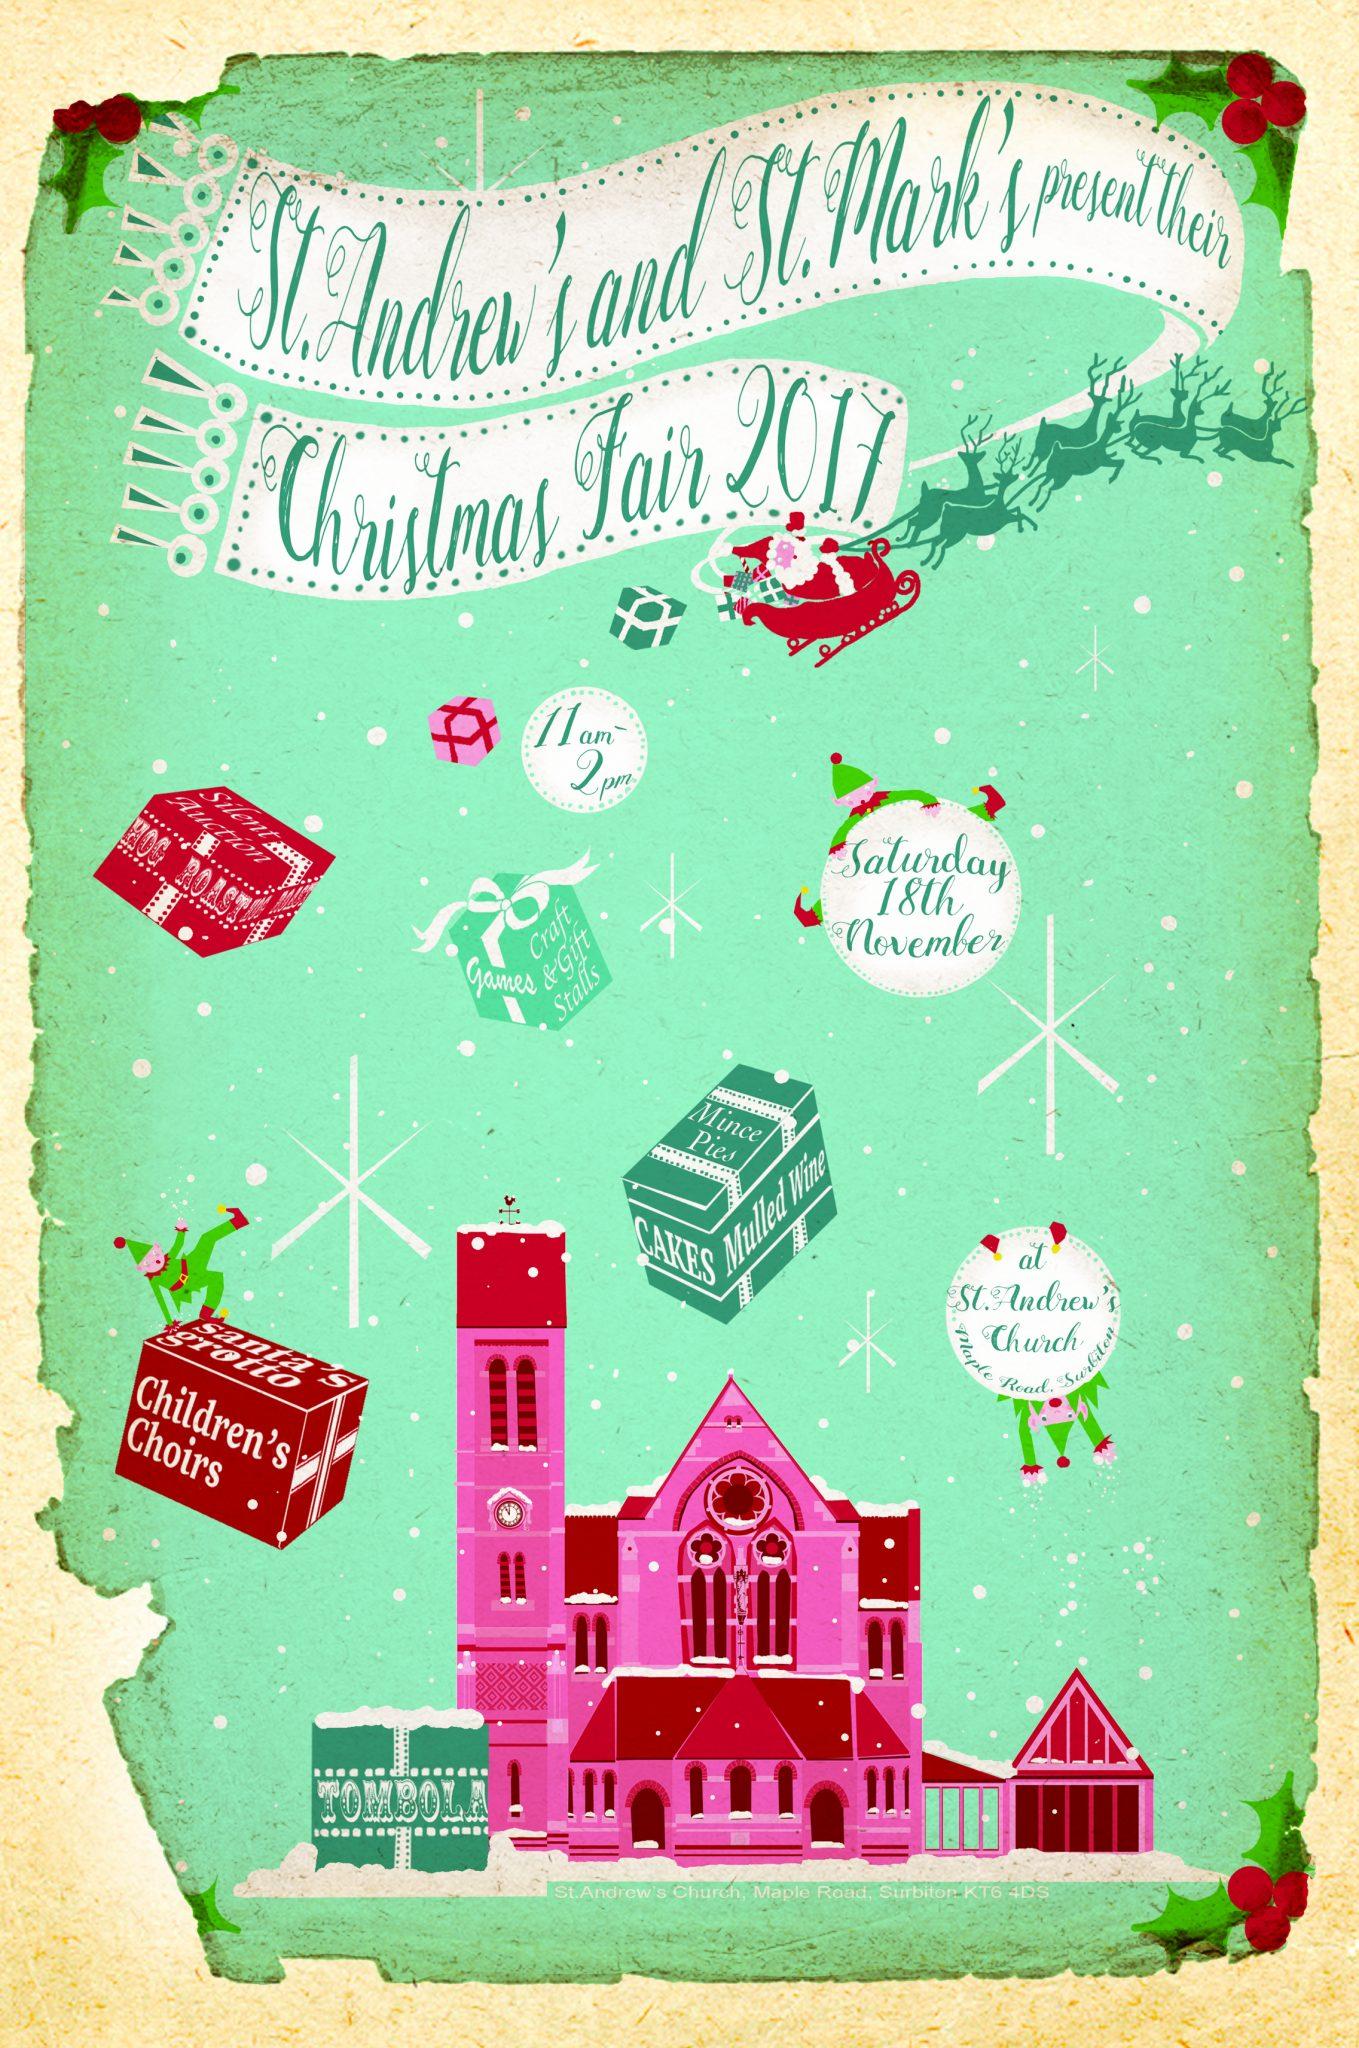 Saturday 18th November 11am – 2pm    St Andrew's Church